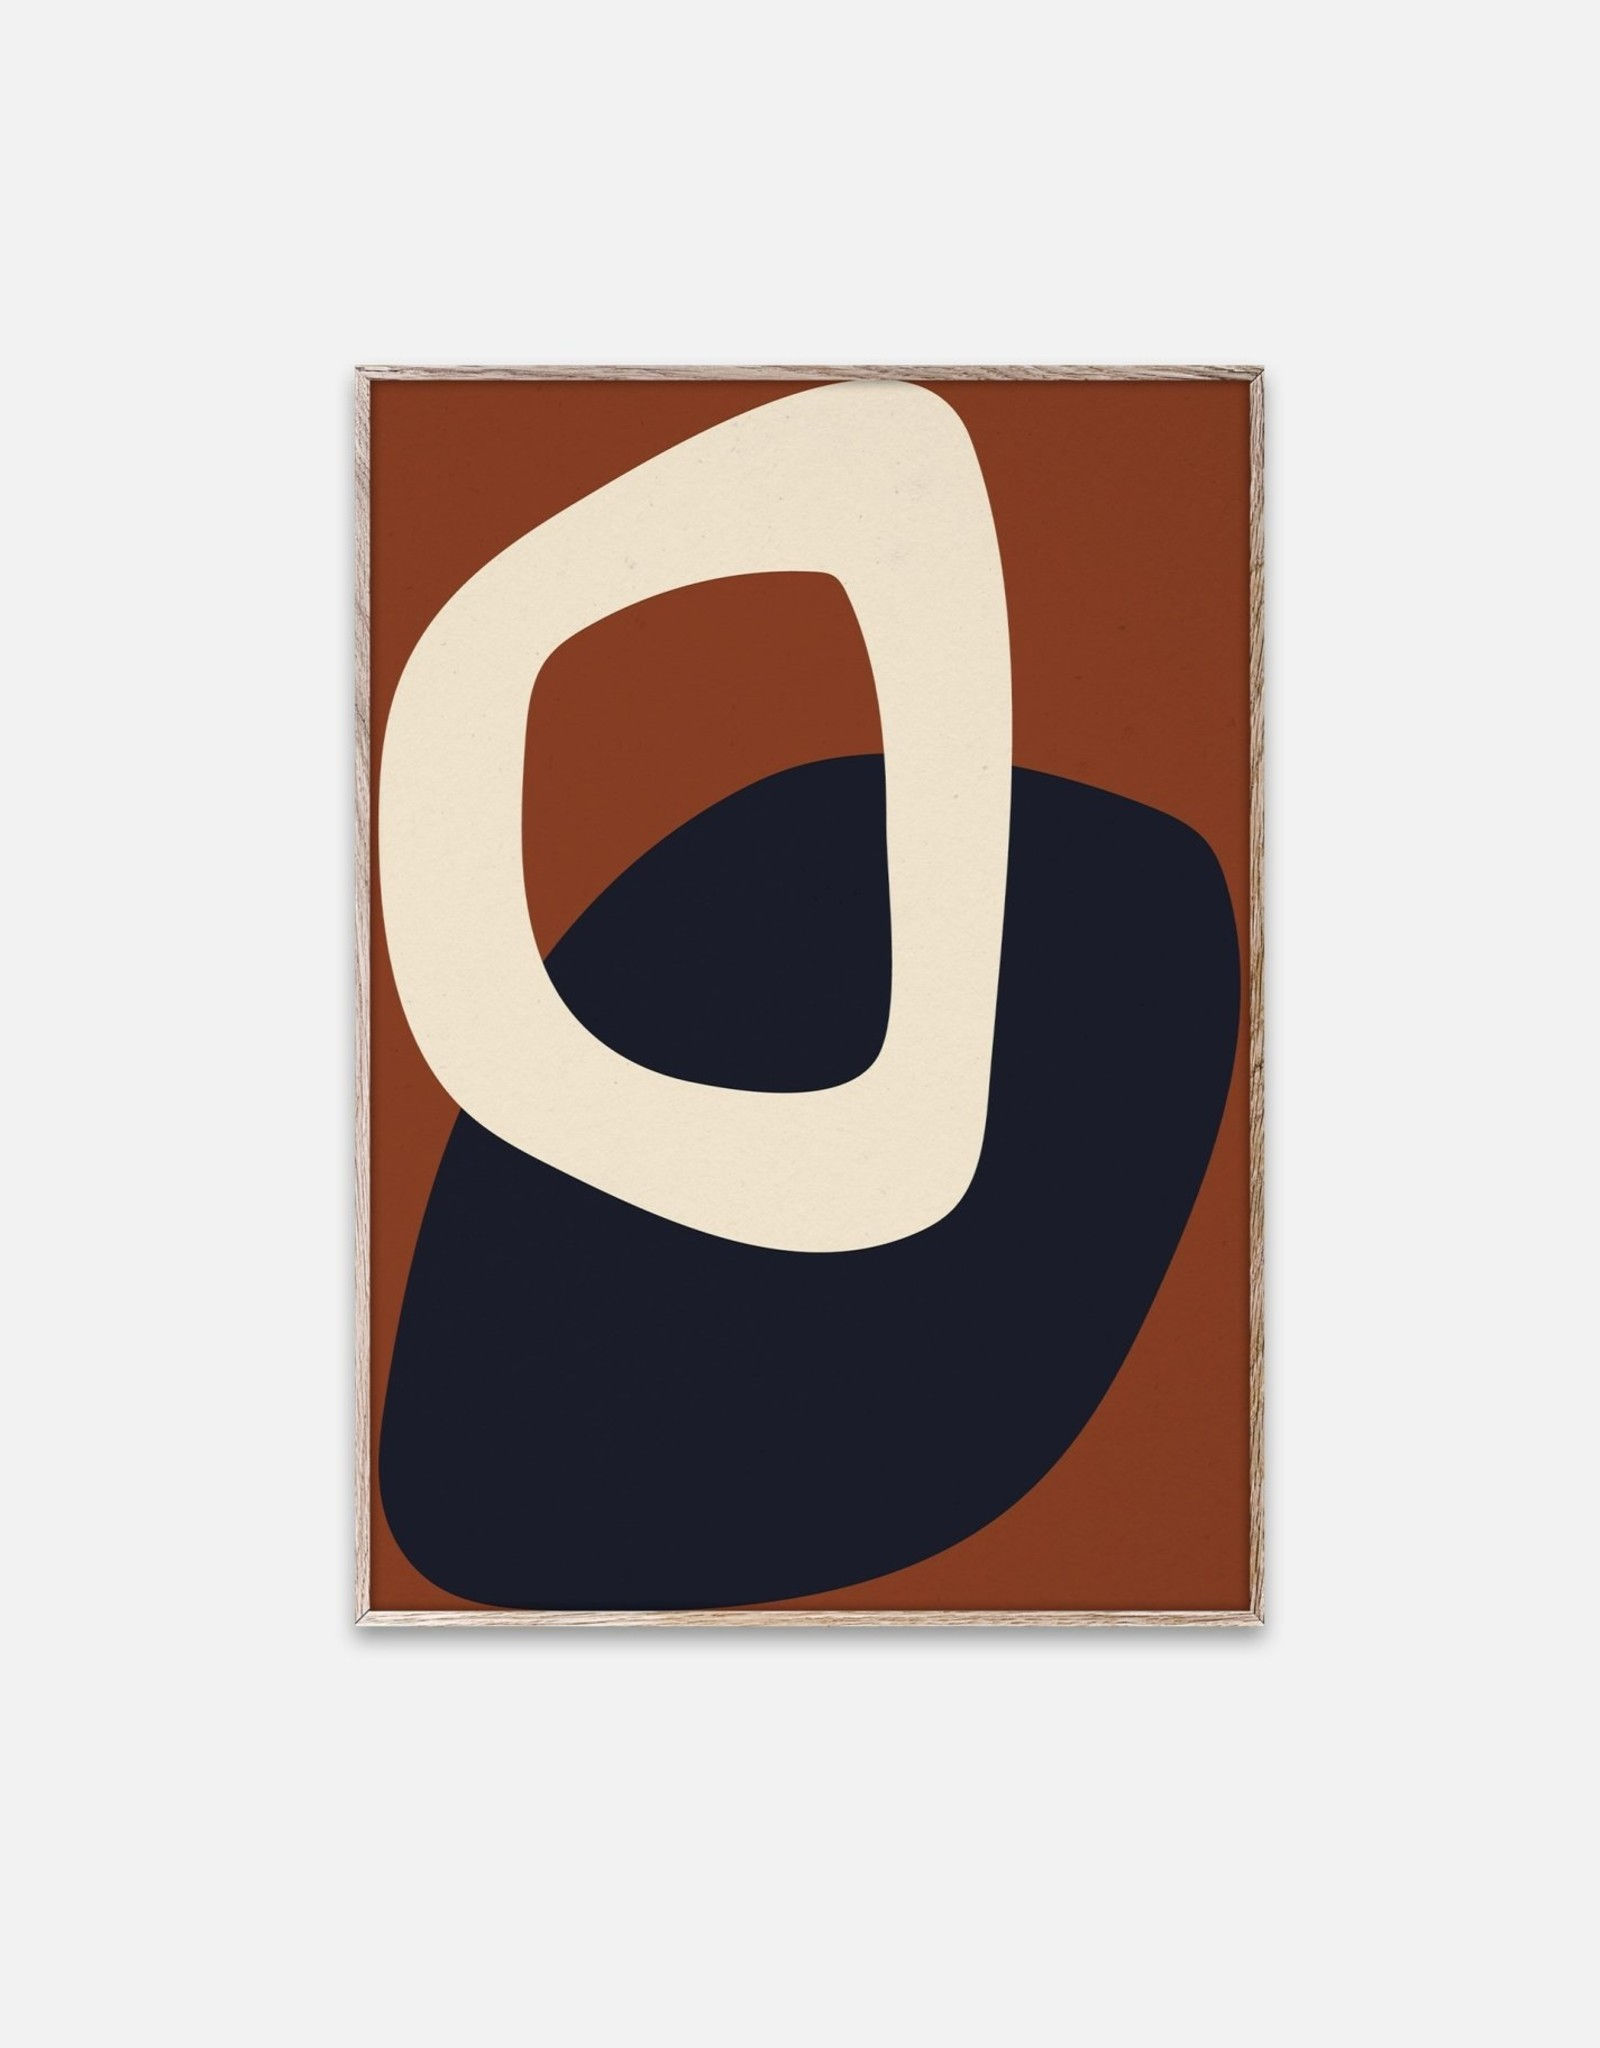 Nina Bruun - Solid Shapes 02 - 30cmx40cm